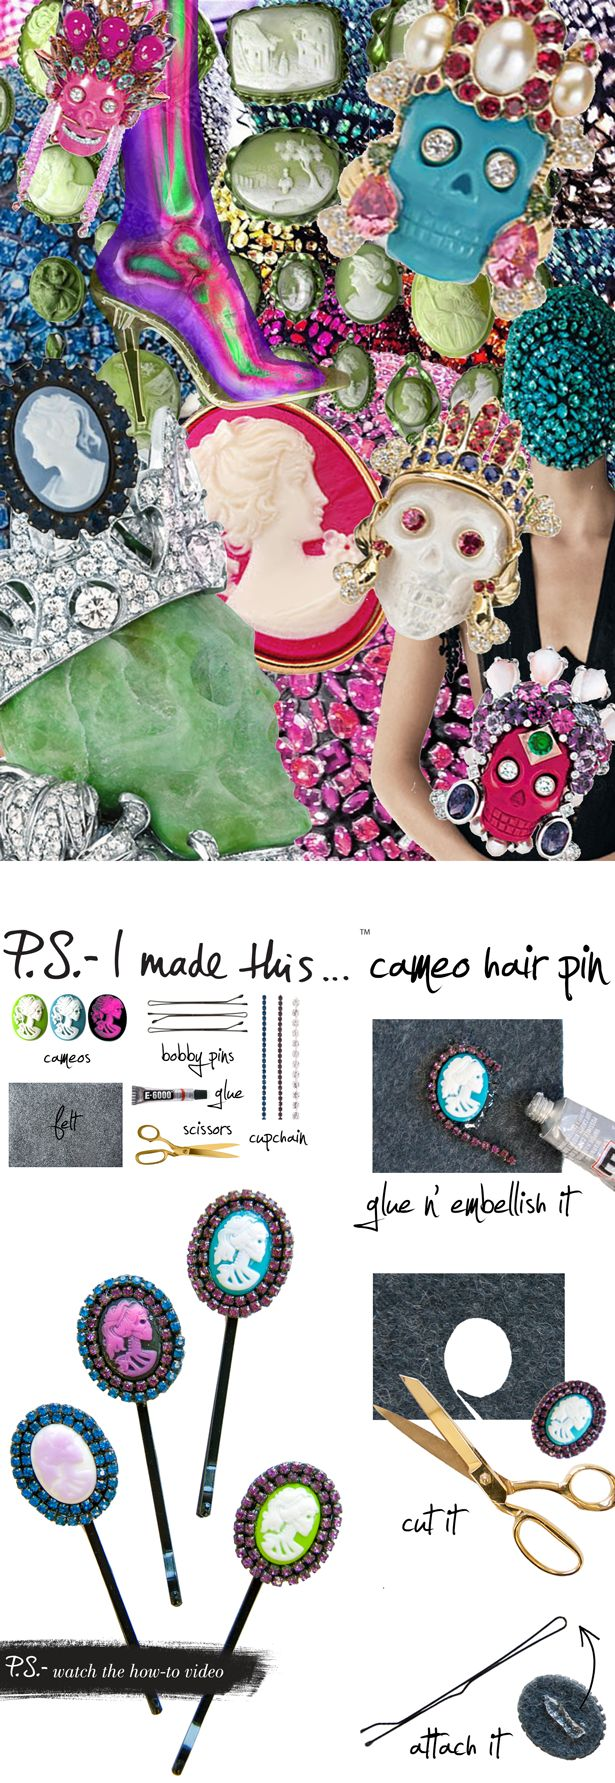 DIY Cameo Hair Pins from psimadethis.com. Gorgeous. #diyaccessories #hairideas